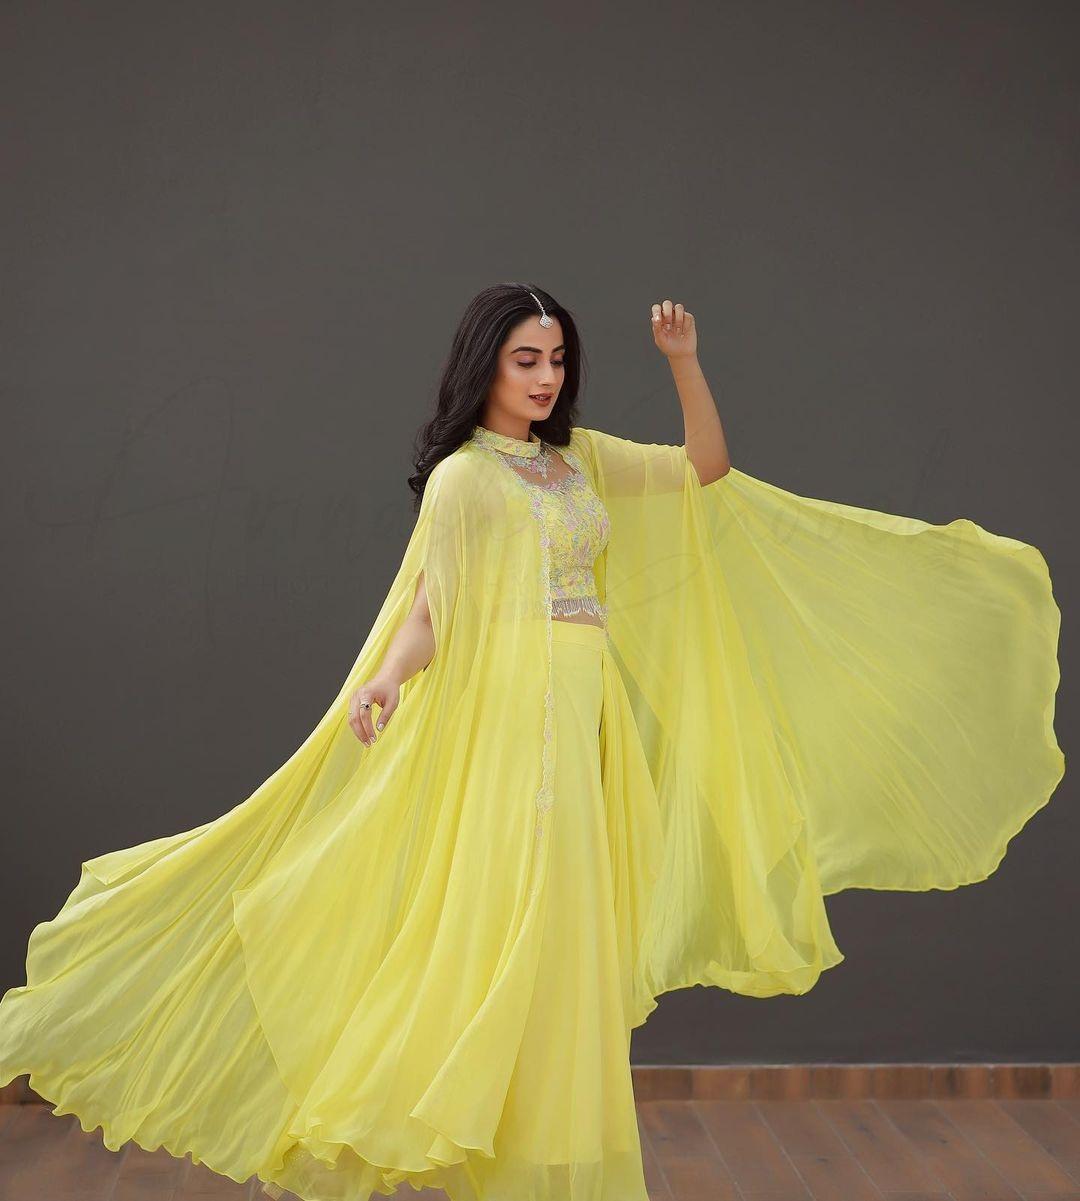 Namitha Pramod in lemon yellow outfit by Jeune Maree3